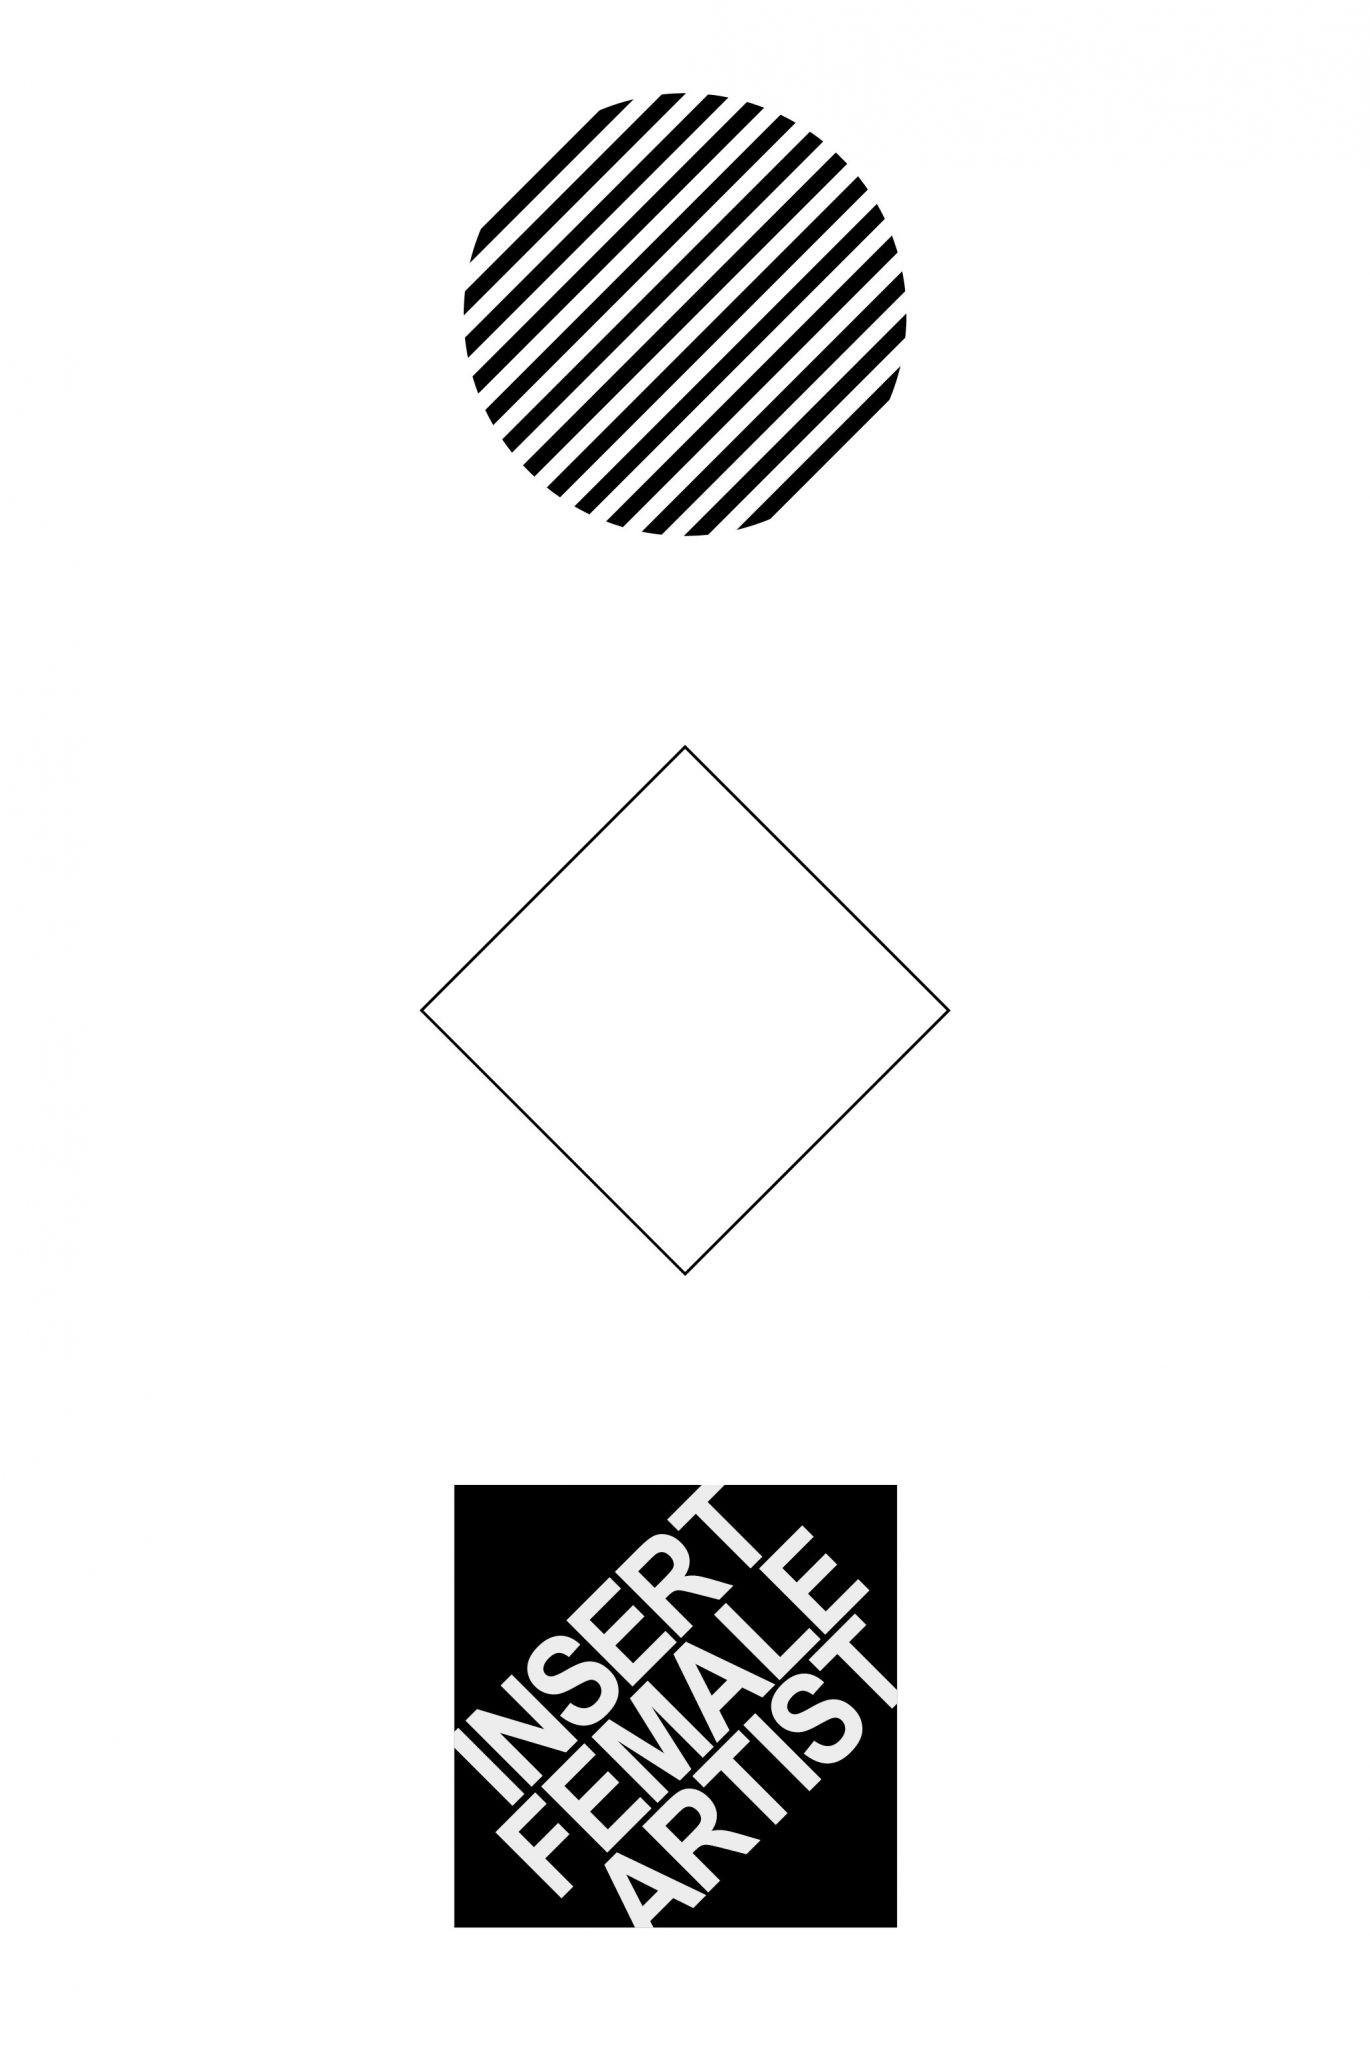 Gestaltungsmittel | Diagonale | Bildmarke |Keyvisual